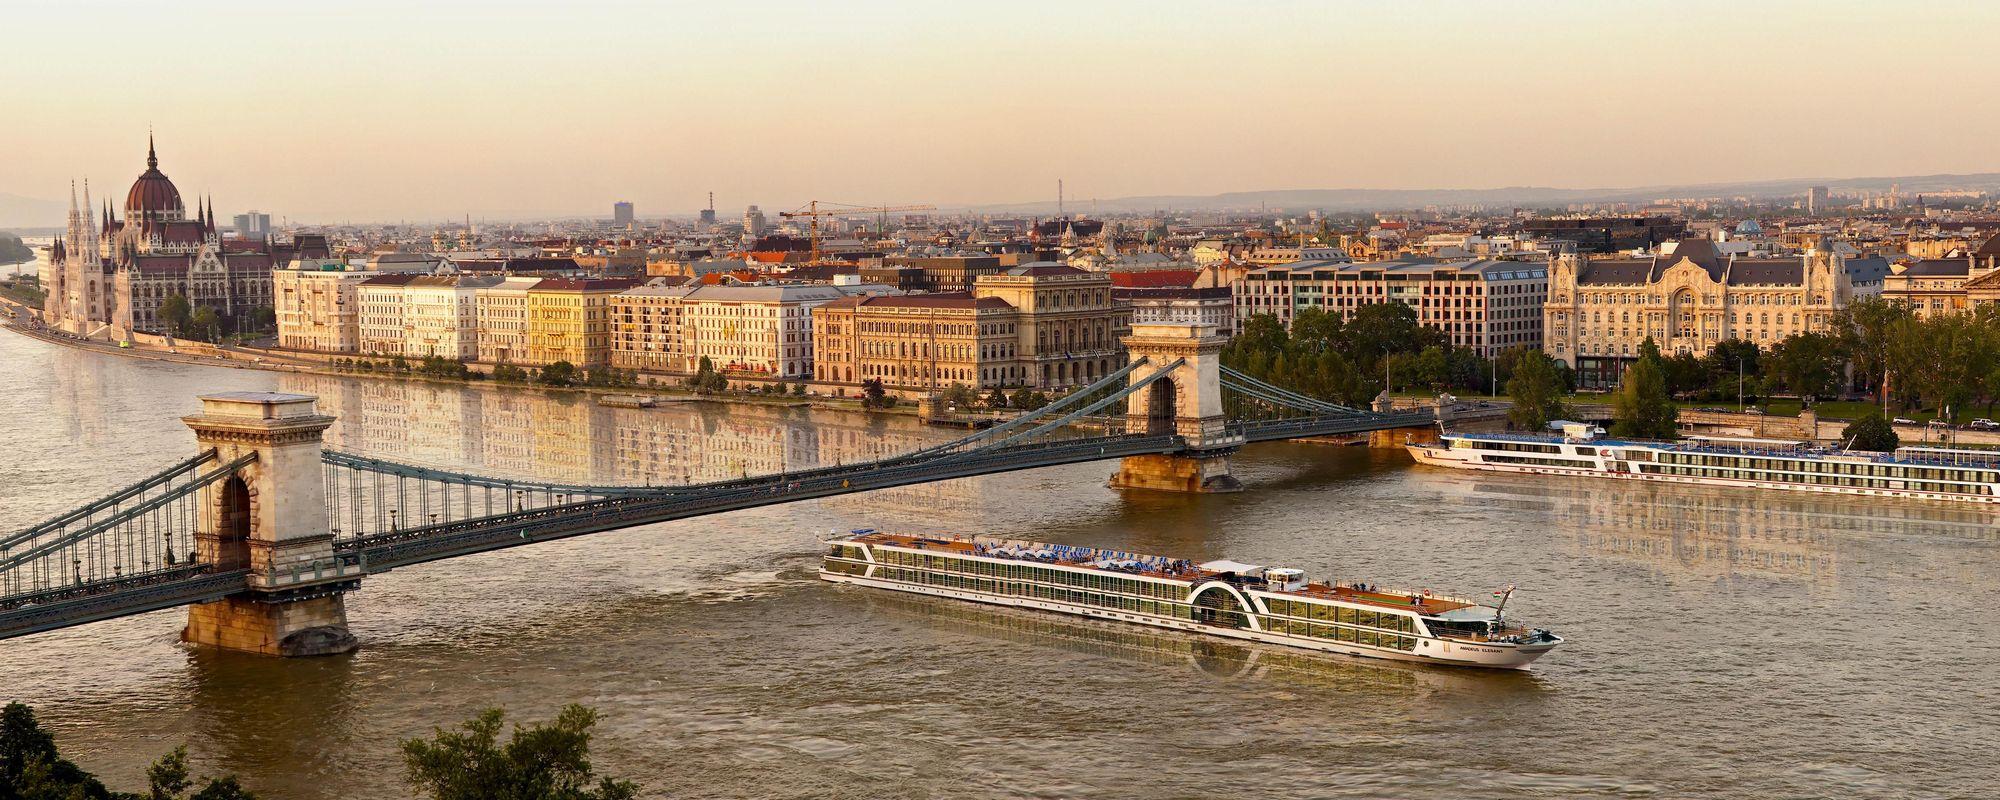 csm_01_AMADEUS_Elegant_Budapest_05_a6cc64b621